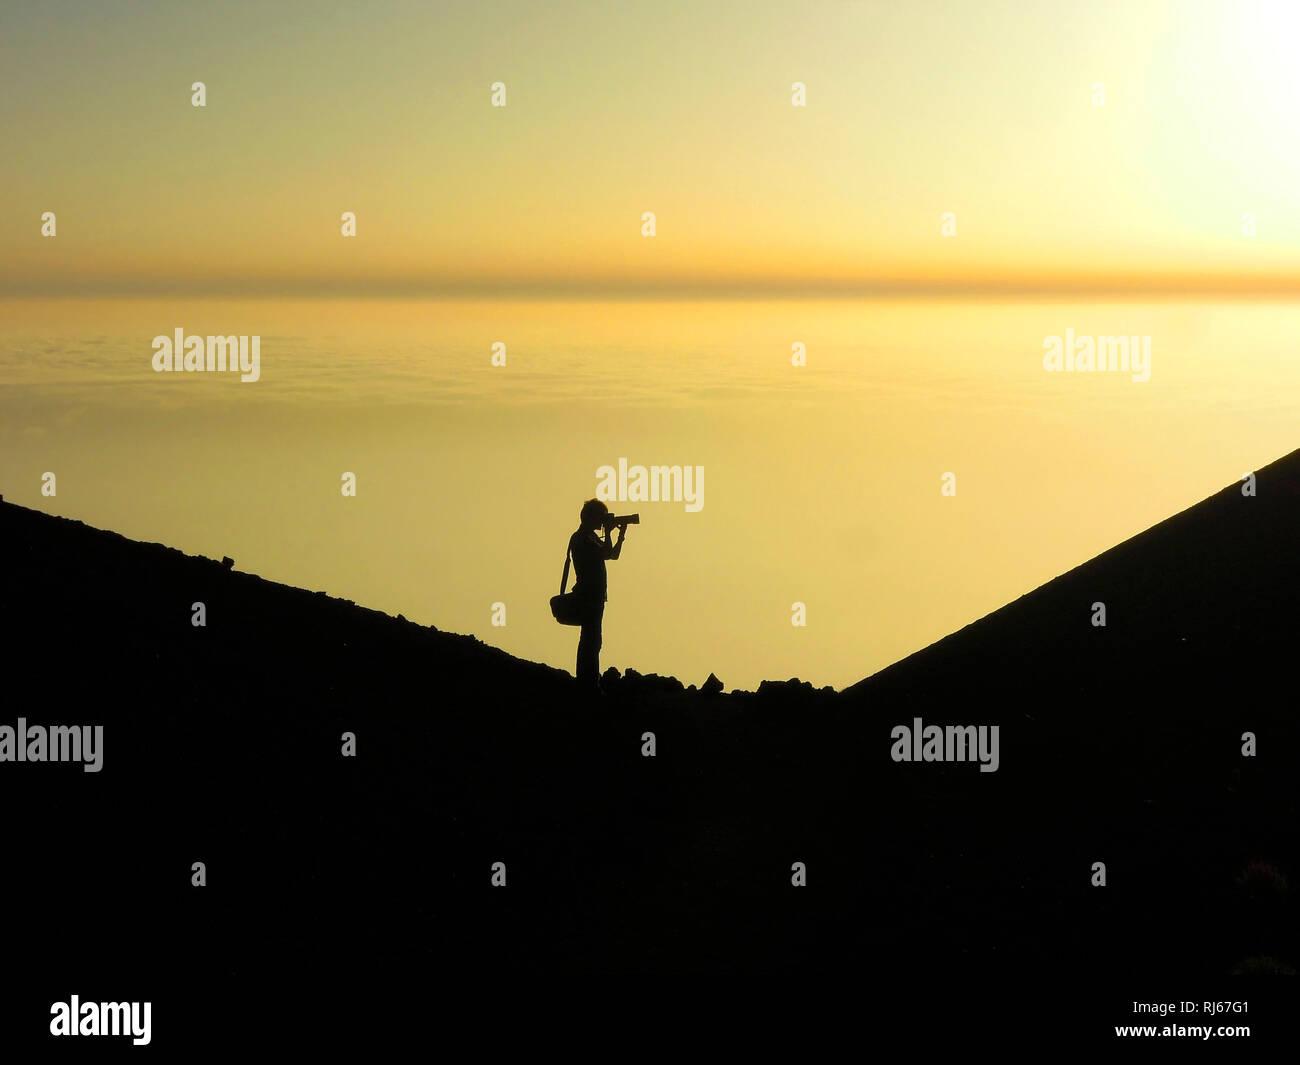 Fotograf fotografiert Sonnenuntergang, Montaña Samara, Nationalpark Teide, Teneriffa, Kanarische Inseln, Spanien - Stock Image